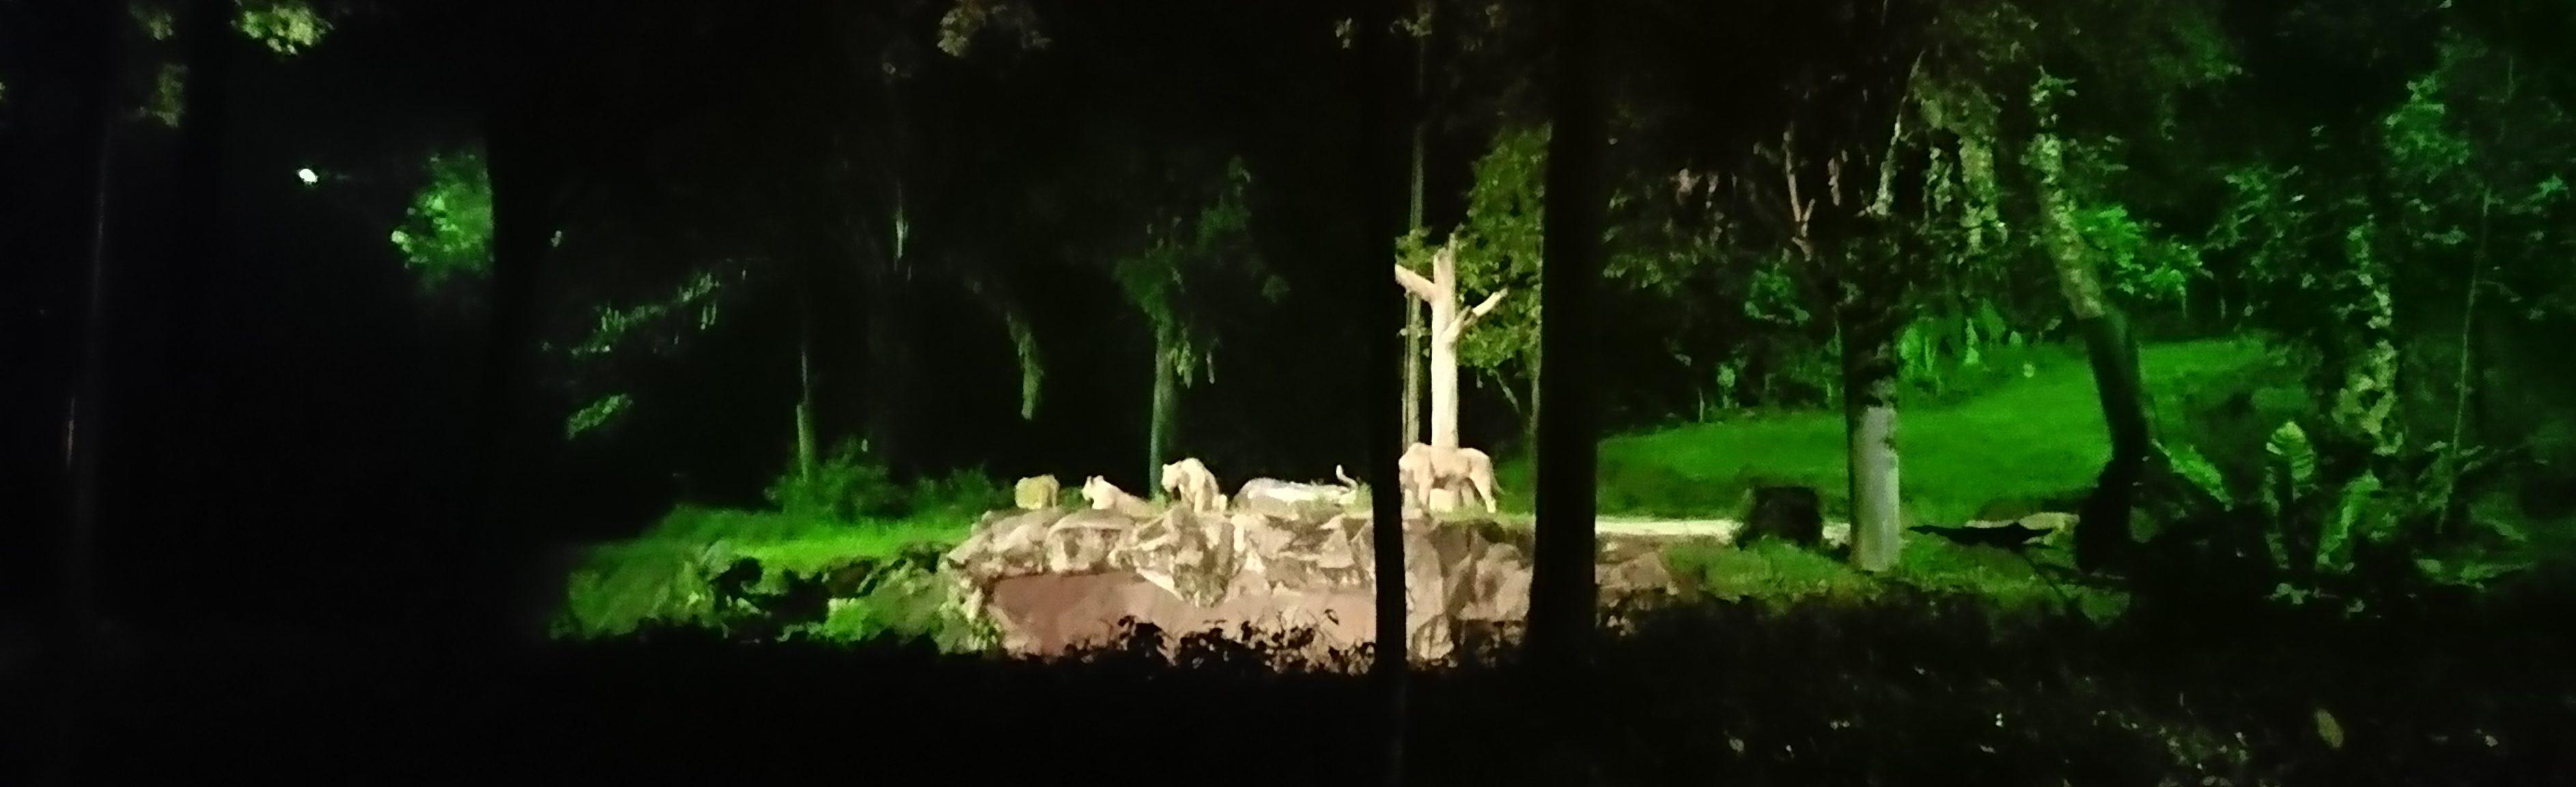 Lions Night Safari Singapore